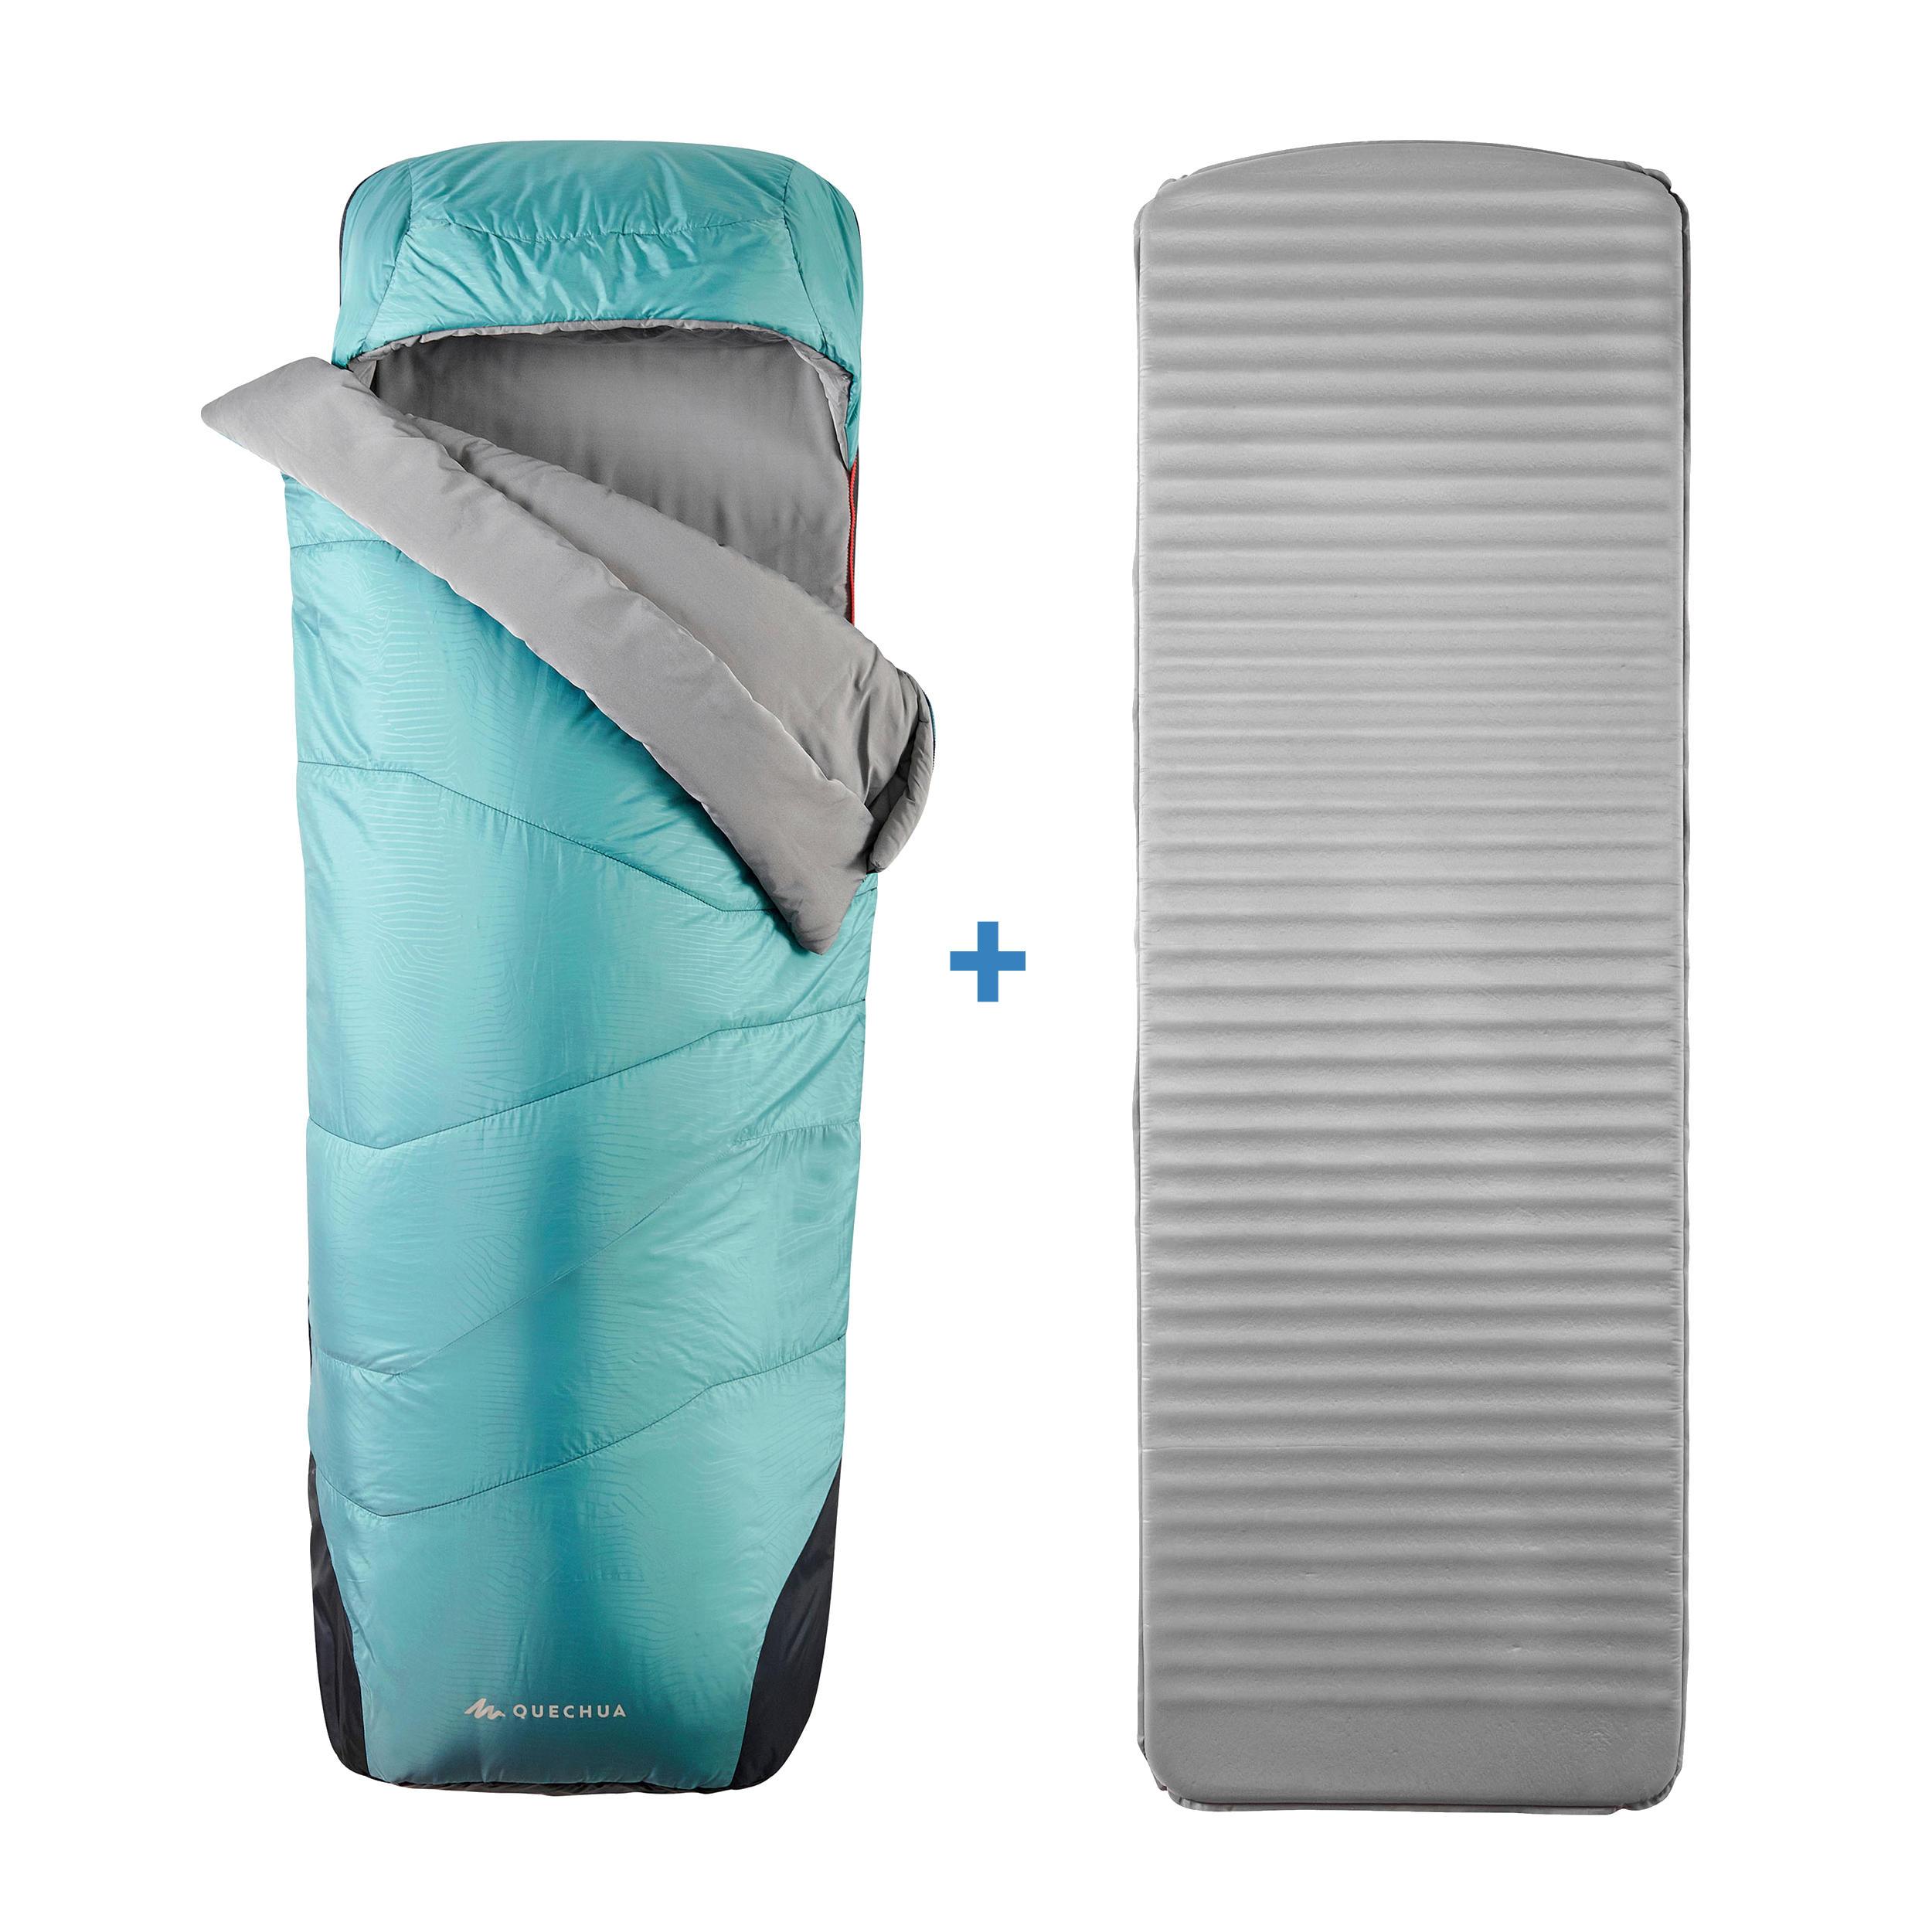 Sac de dormit MH500 5°C L imagine